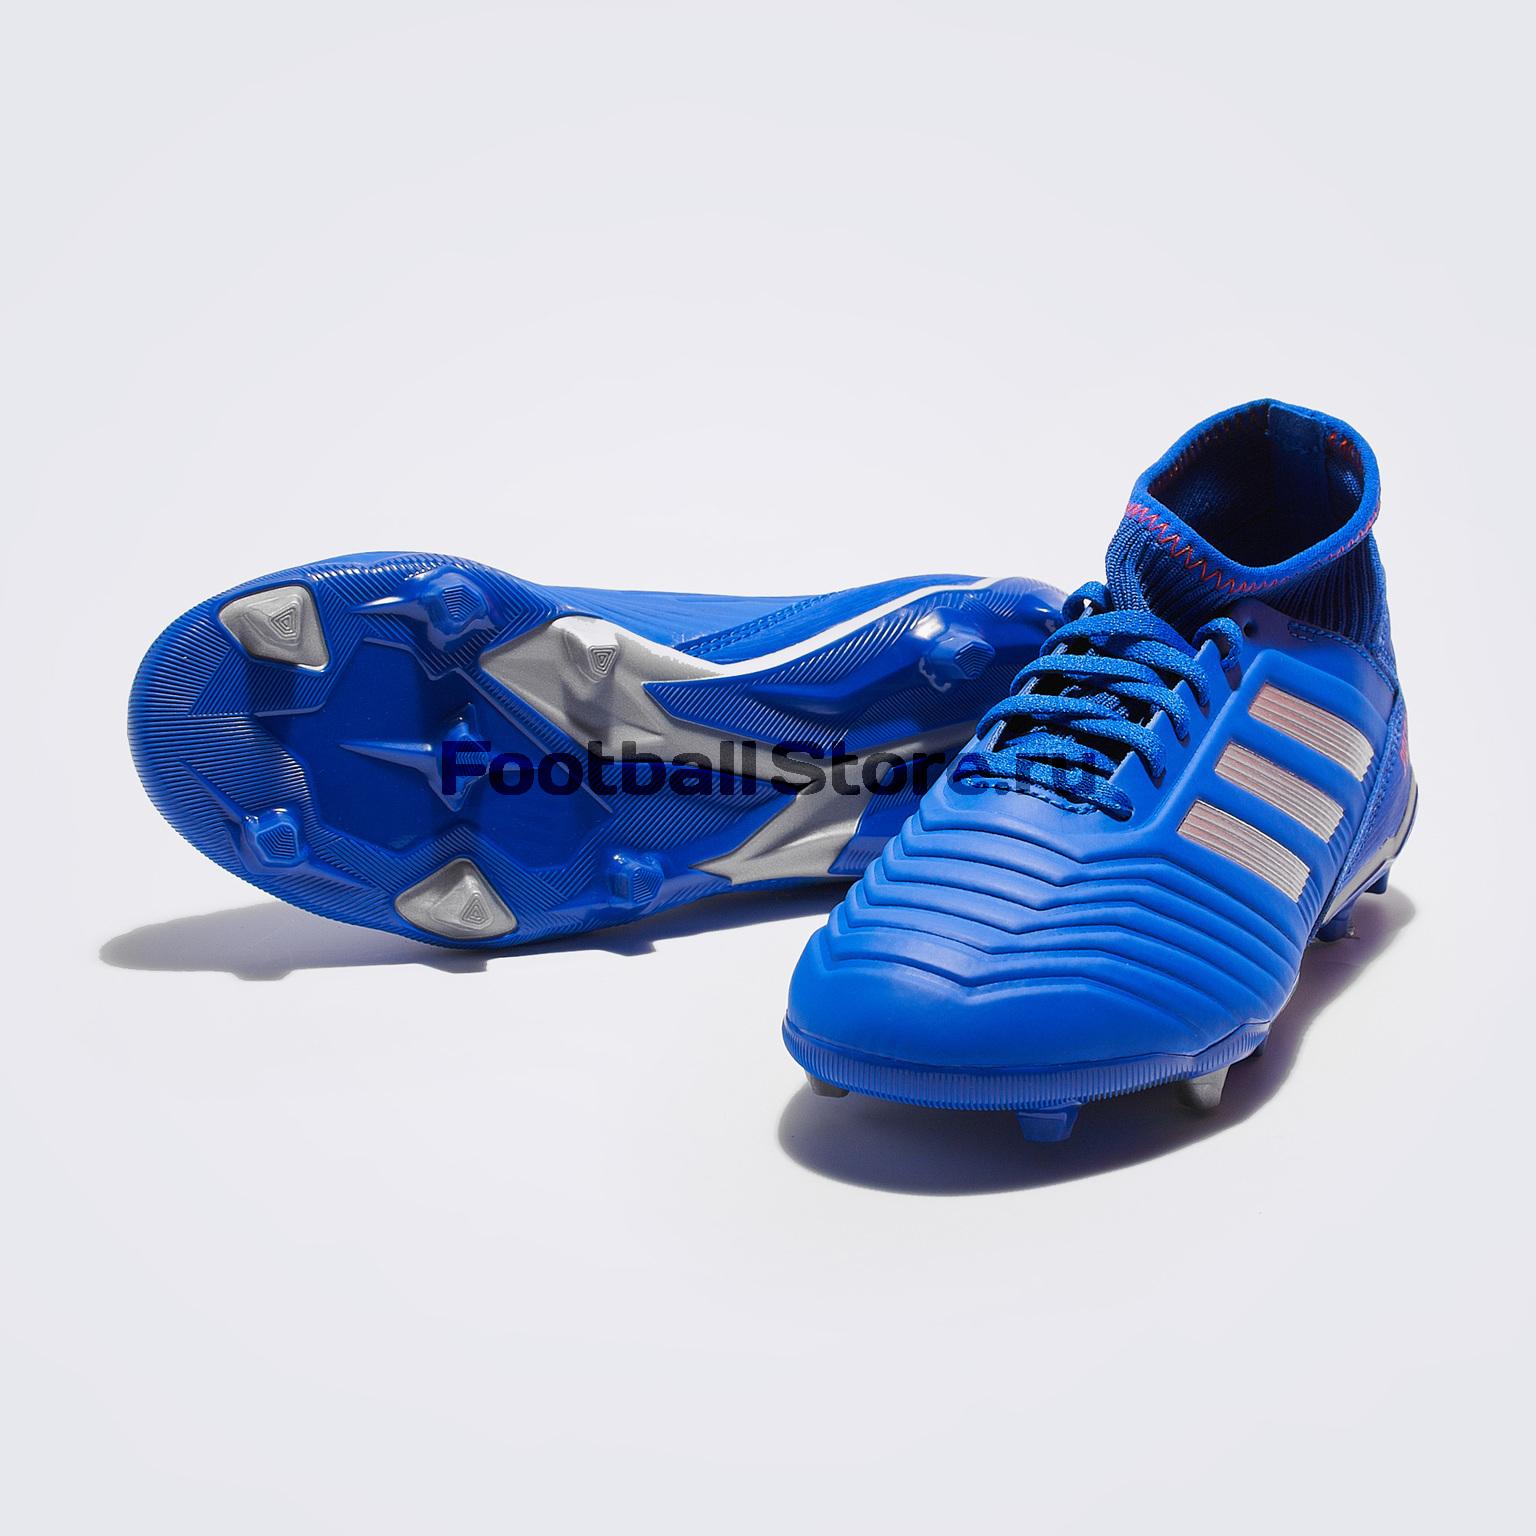 Бутсы детские Adidas Predator 19.3 FG CM8533 бутсы adidas messi 16 1 fg jr bb3852